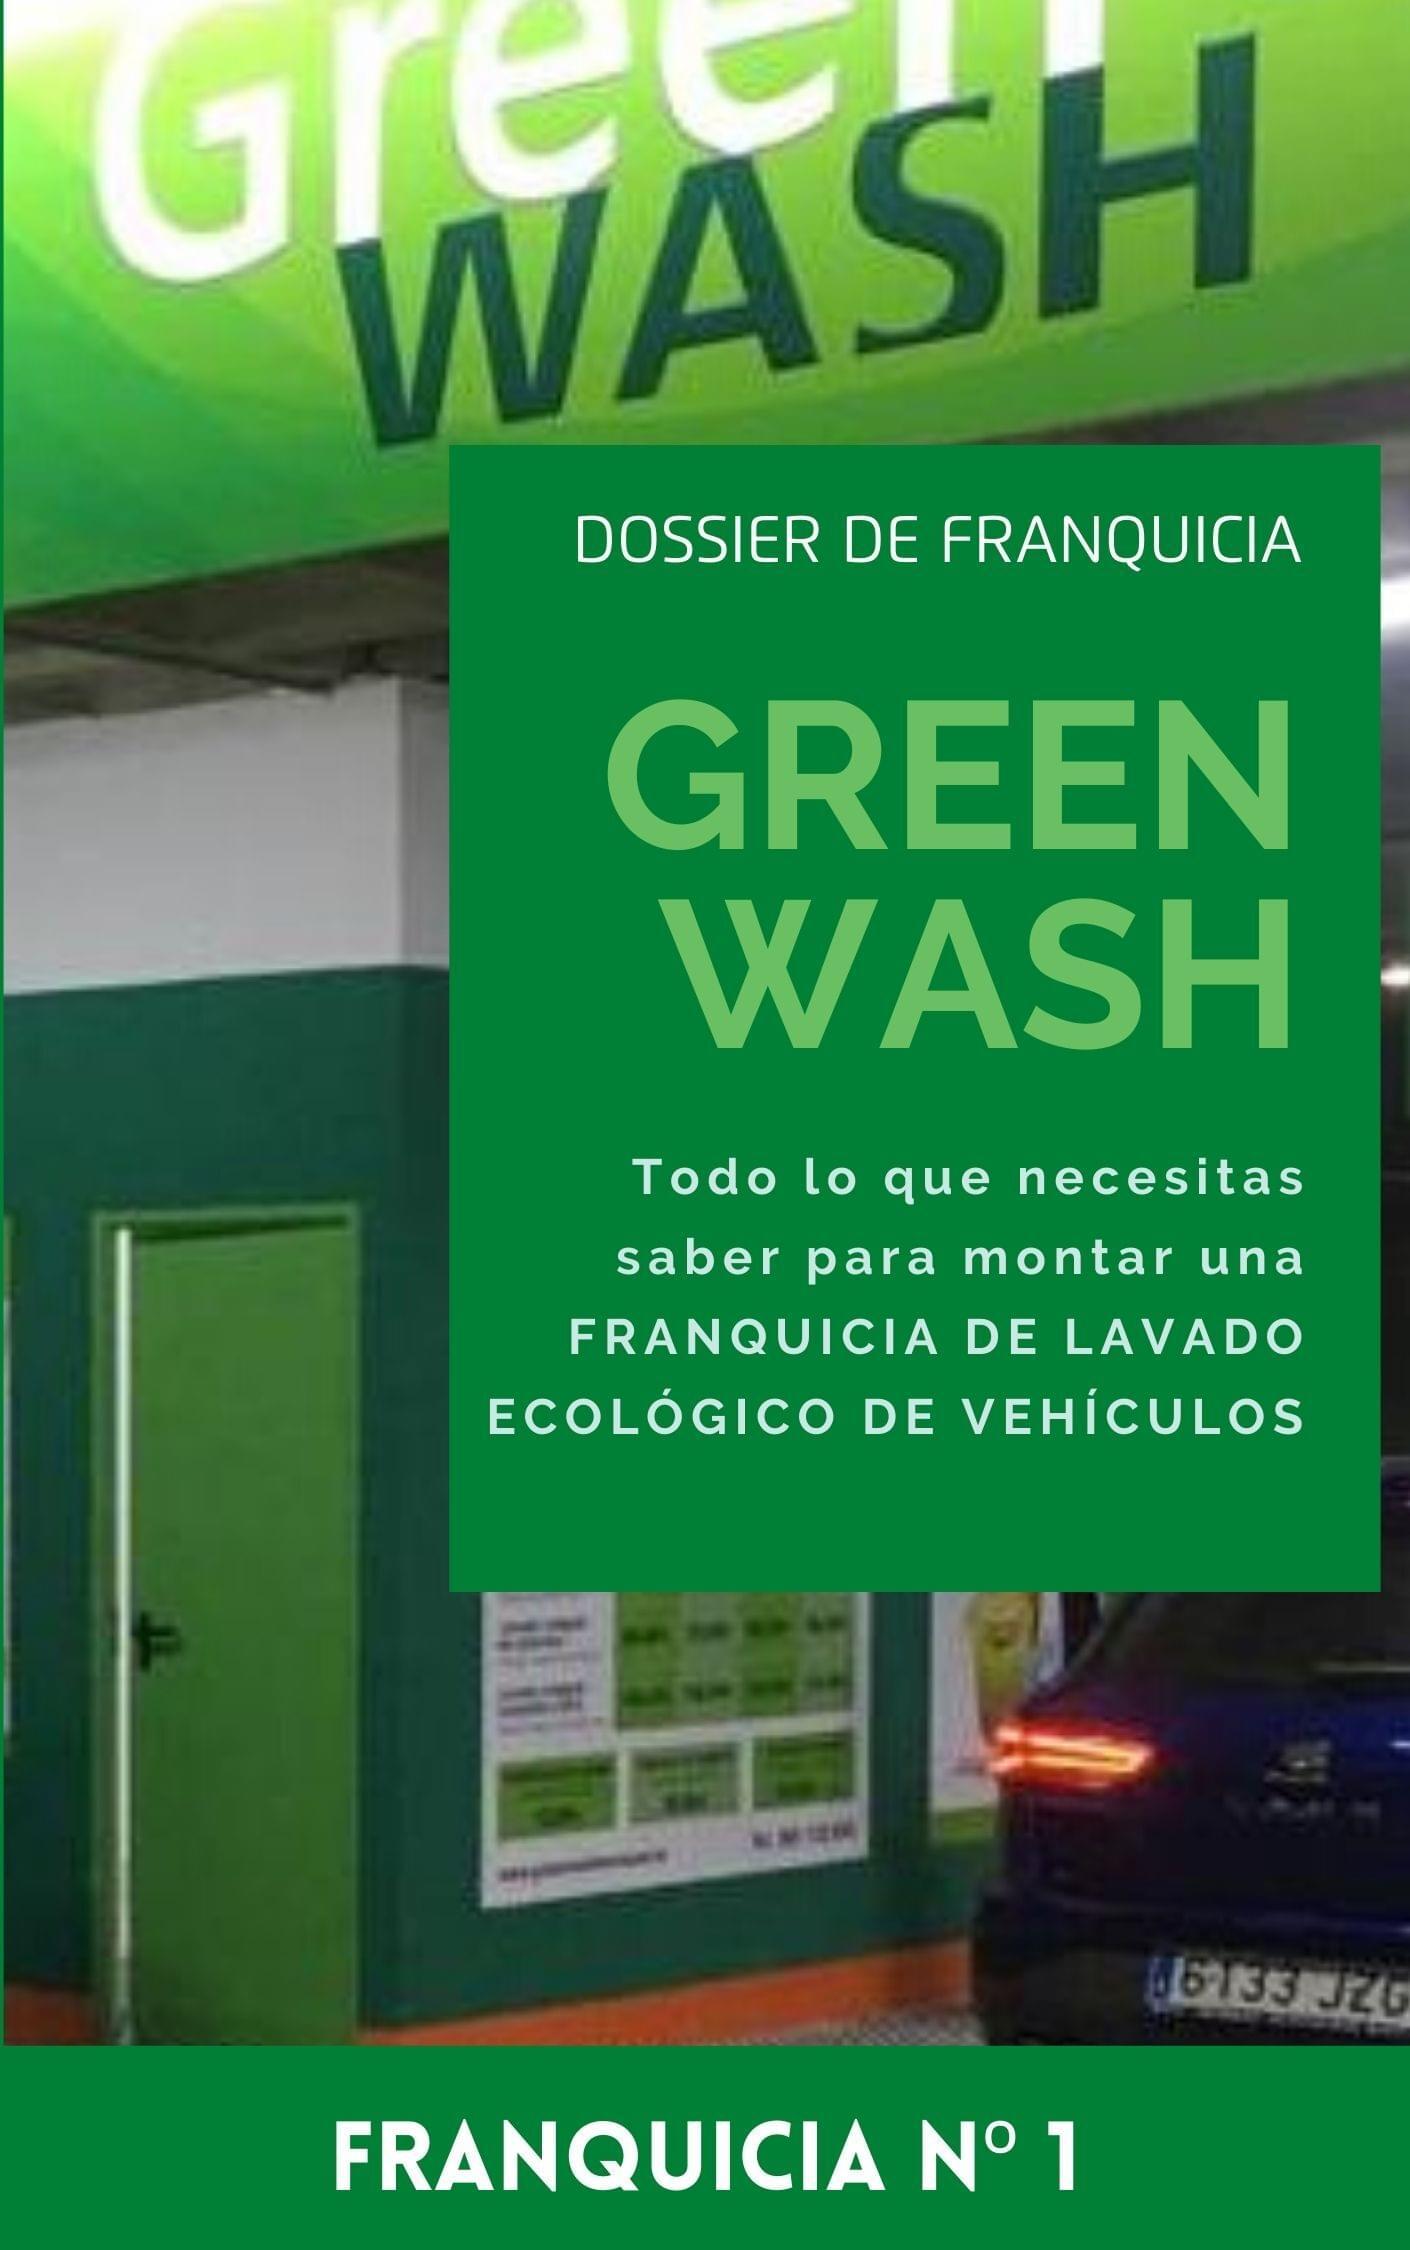 Green Wash Franquicia